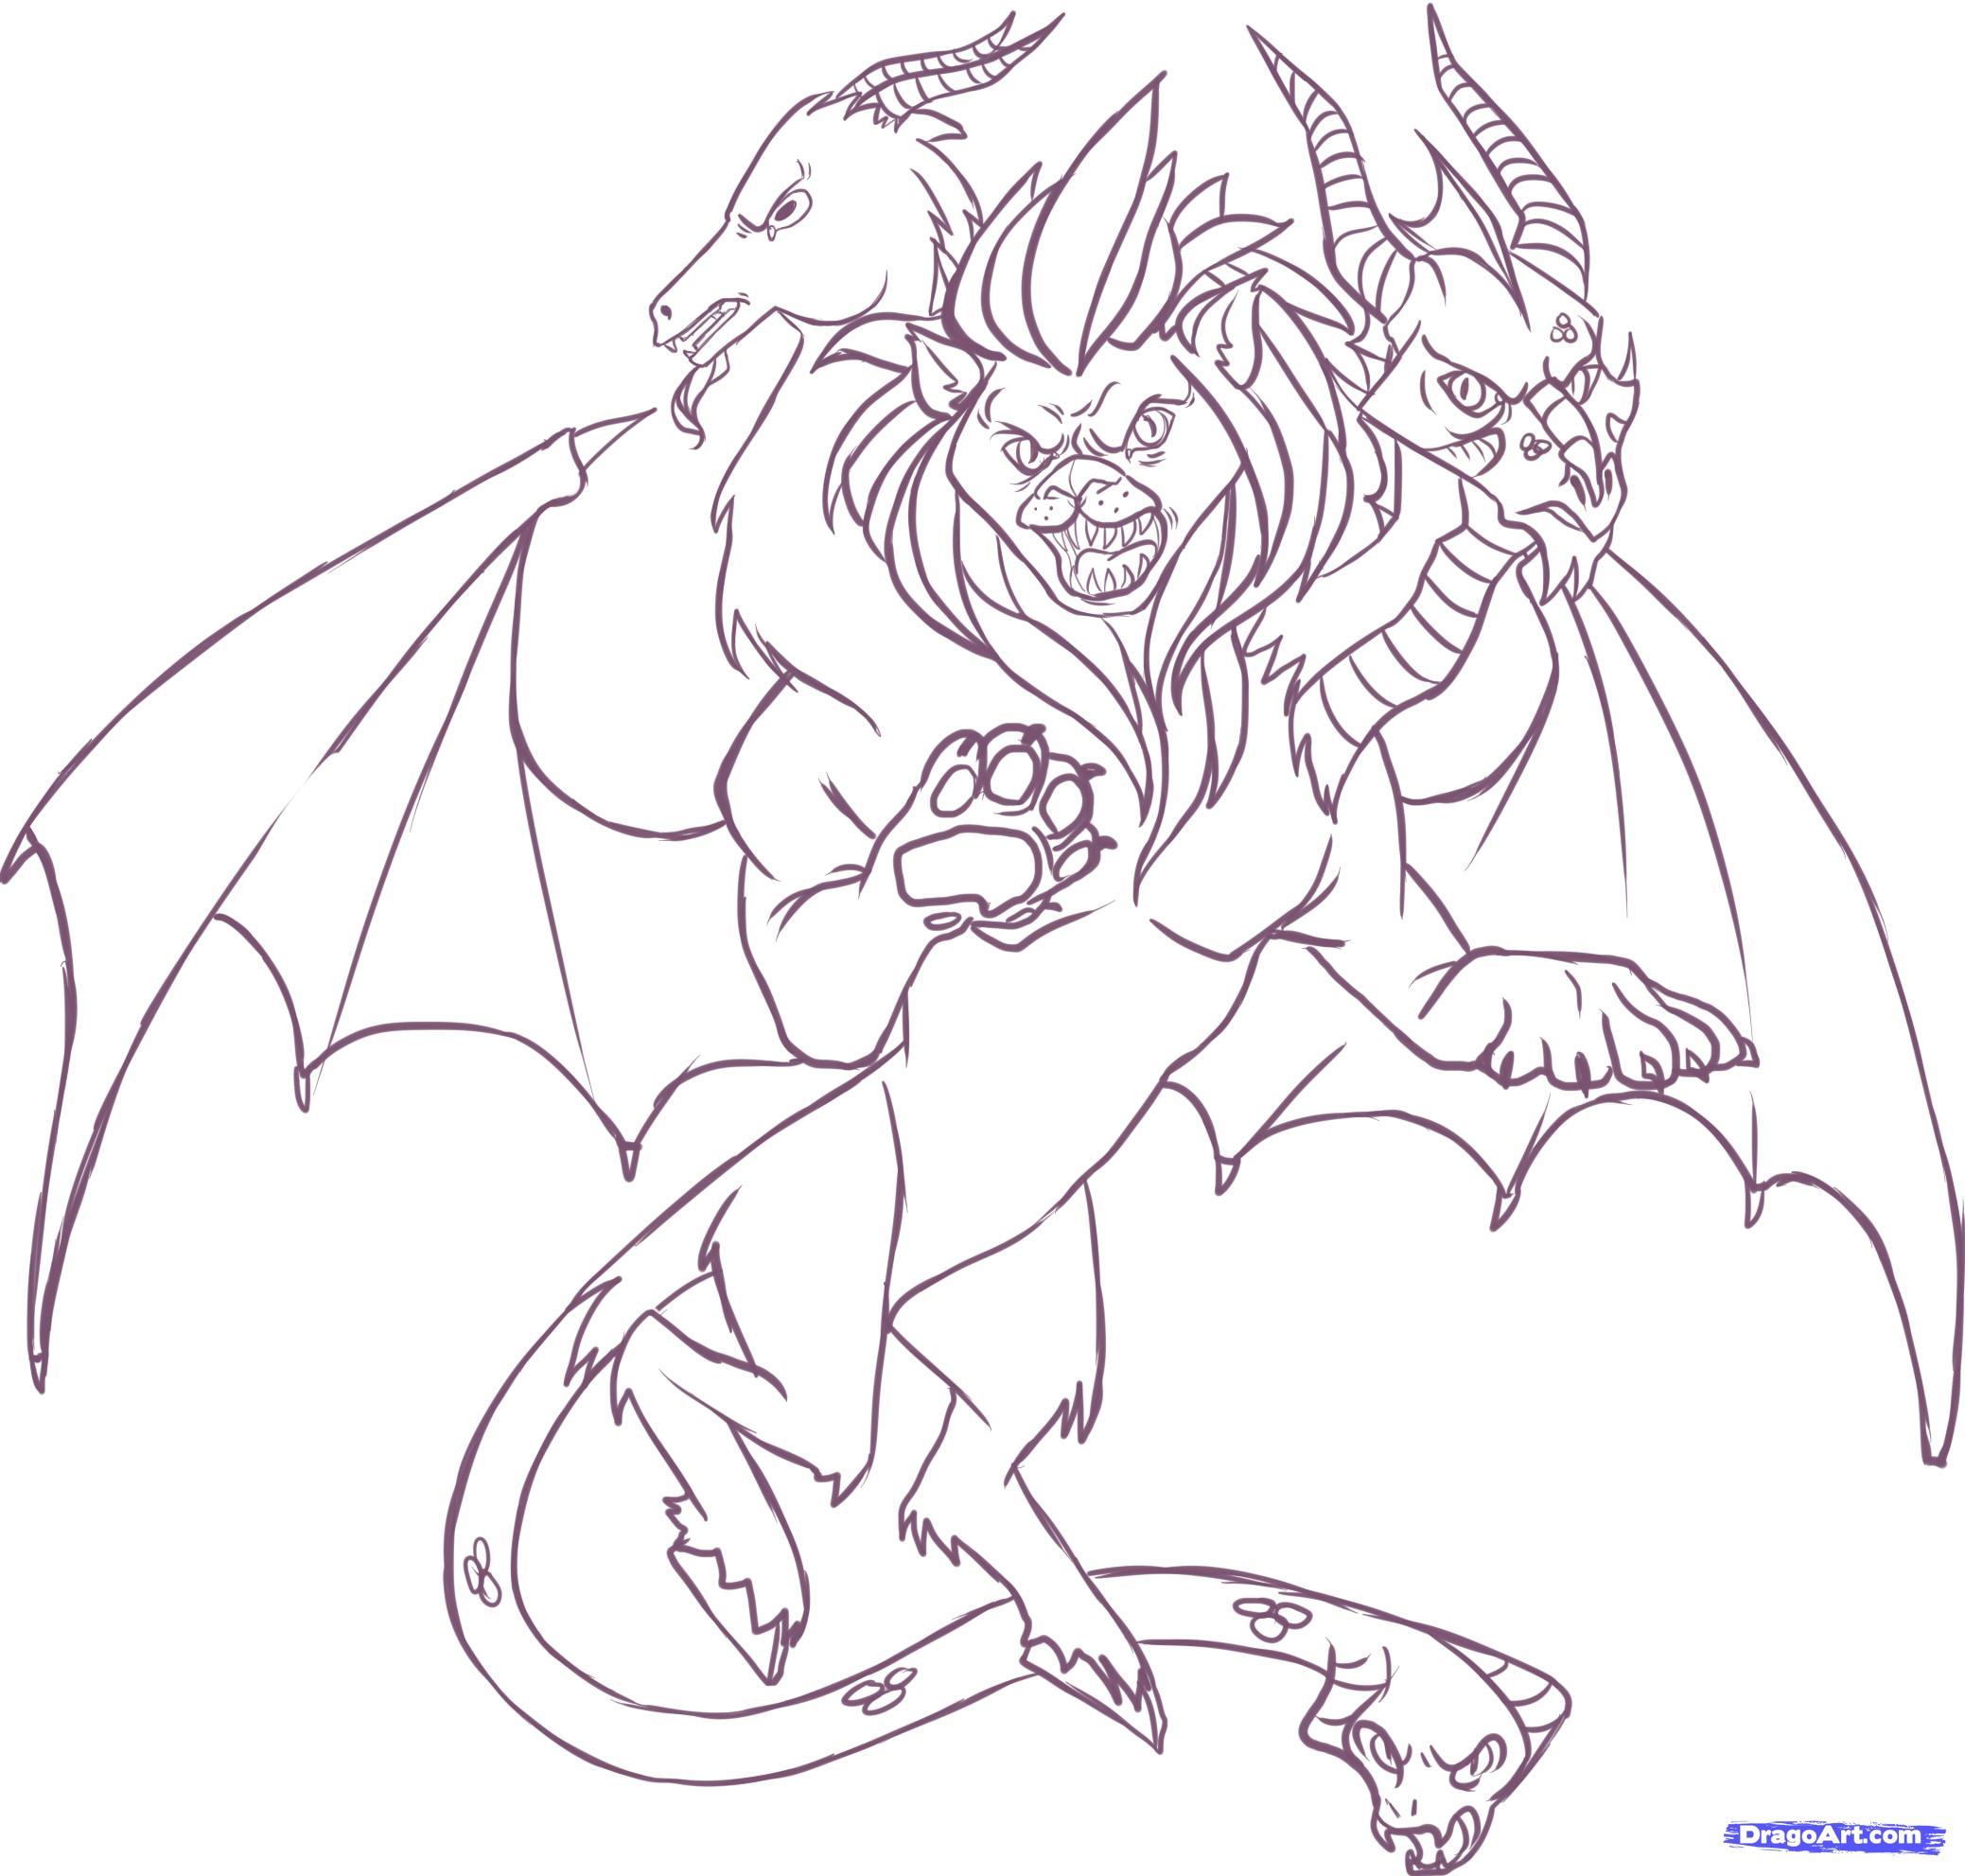 Chimera coloring #9, Download drawings